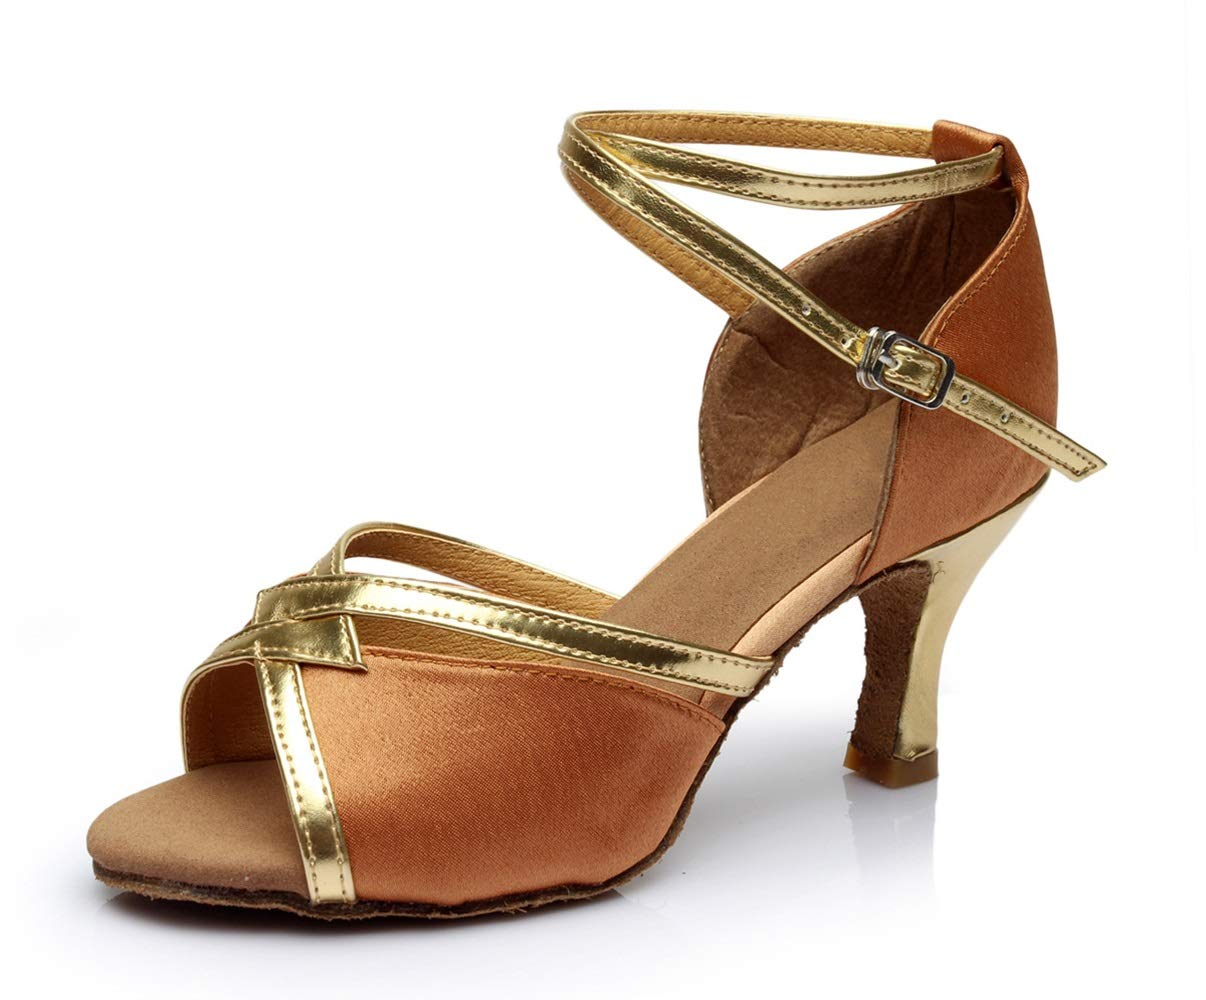 Tanzschuhe mit hohen Absätzen Frauen weiche untere Latin Dance Schuhe Ballroom Erwachsene Ballroom Schuhe Dance Schuhe England Square Dance (Farbe   braun größe   US6 EU36 UK4 CN36) 710f11